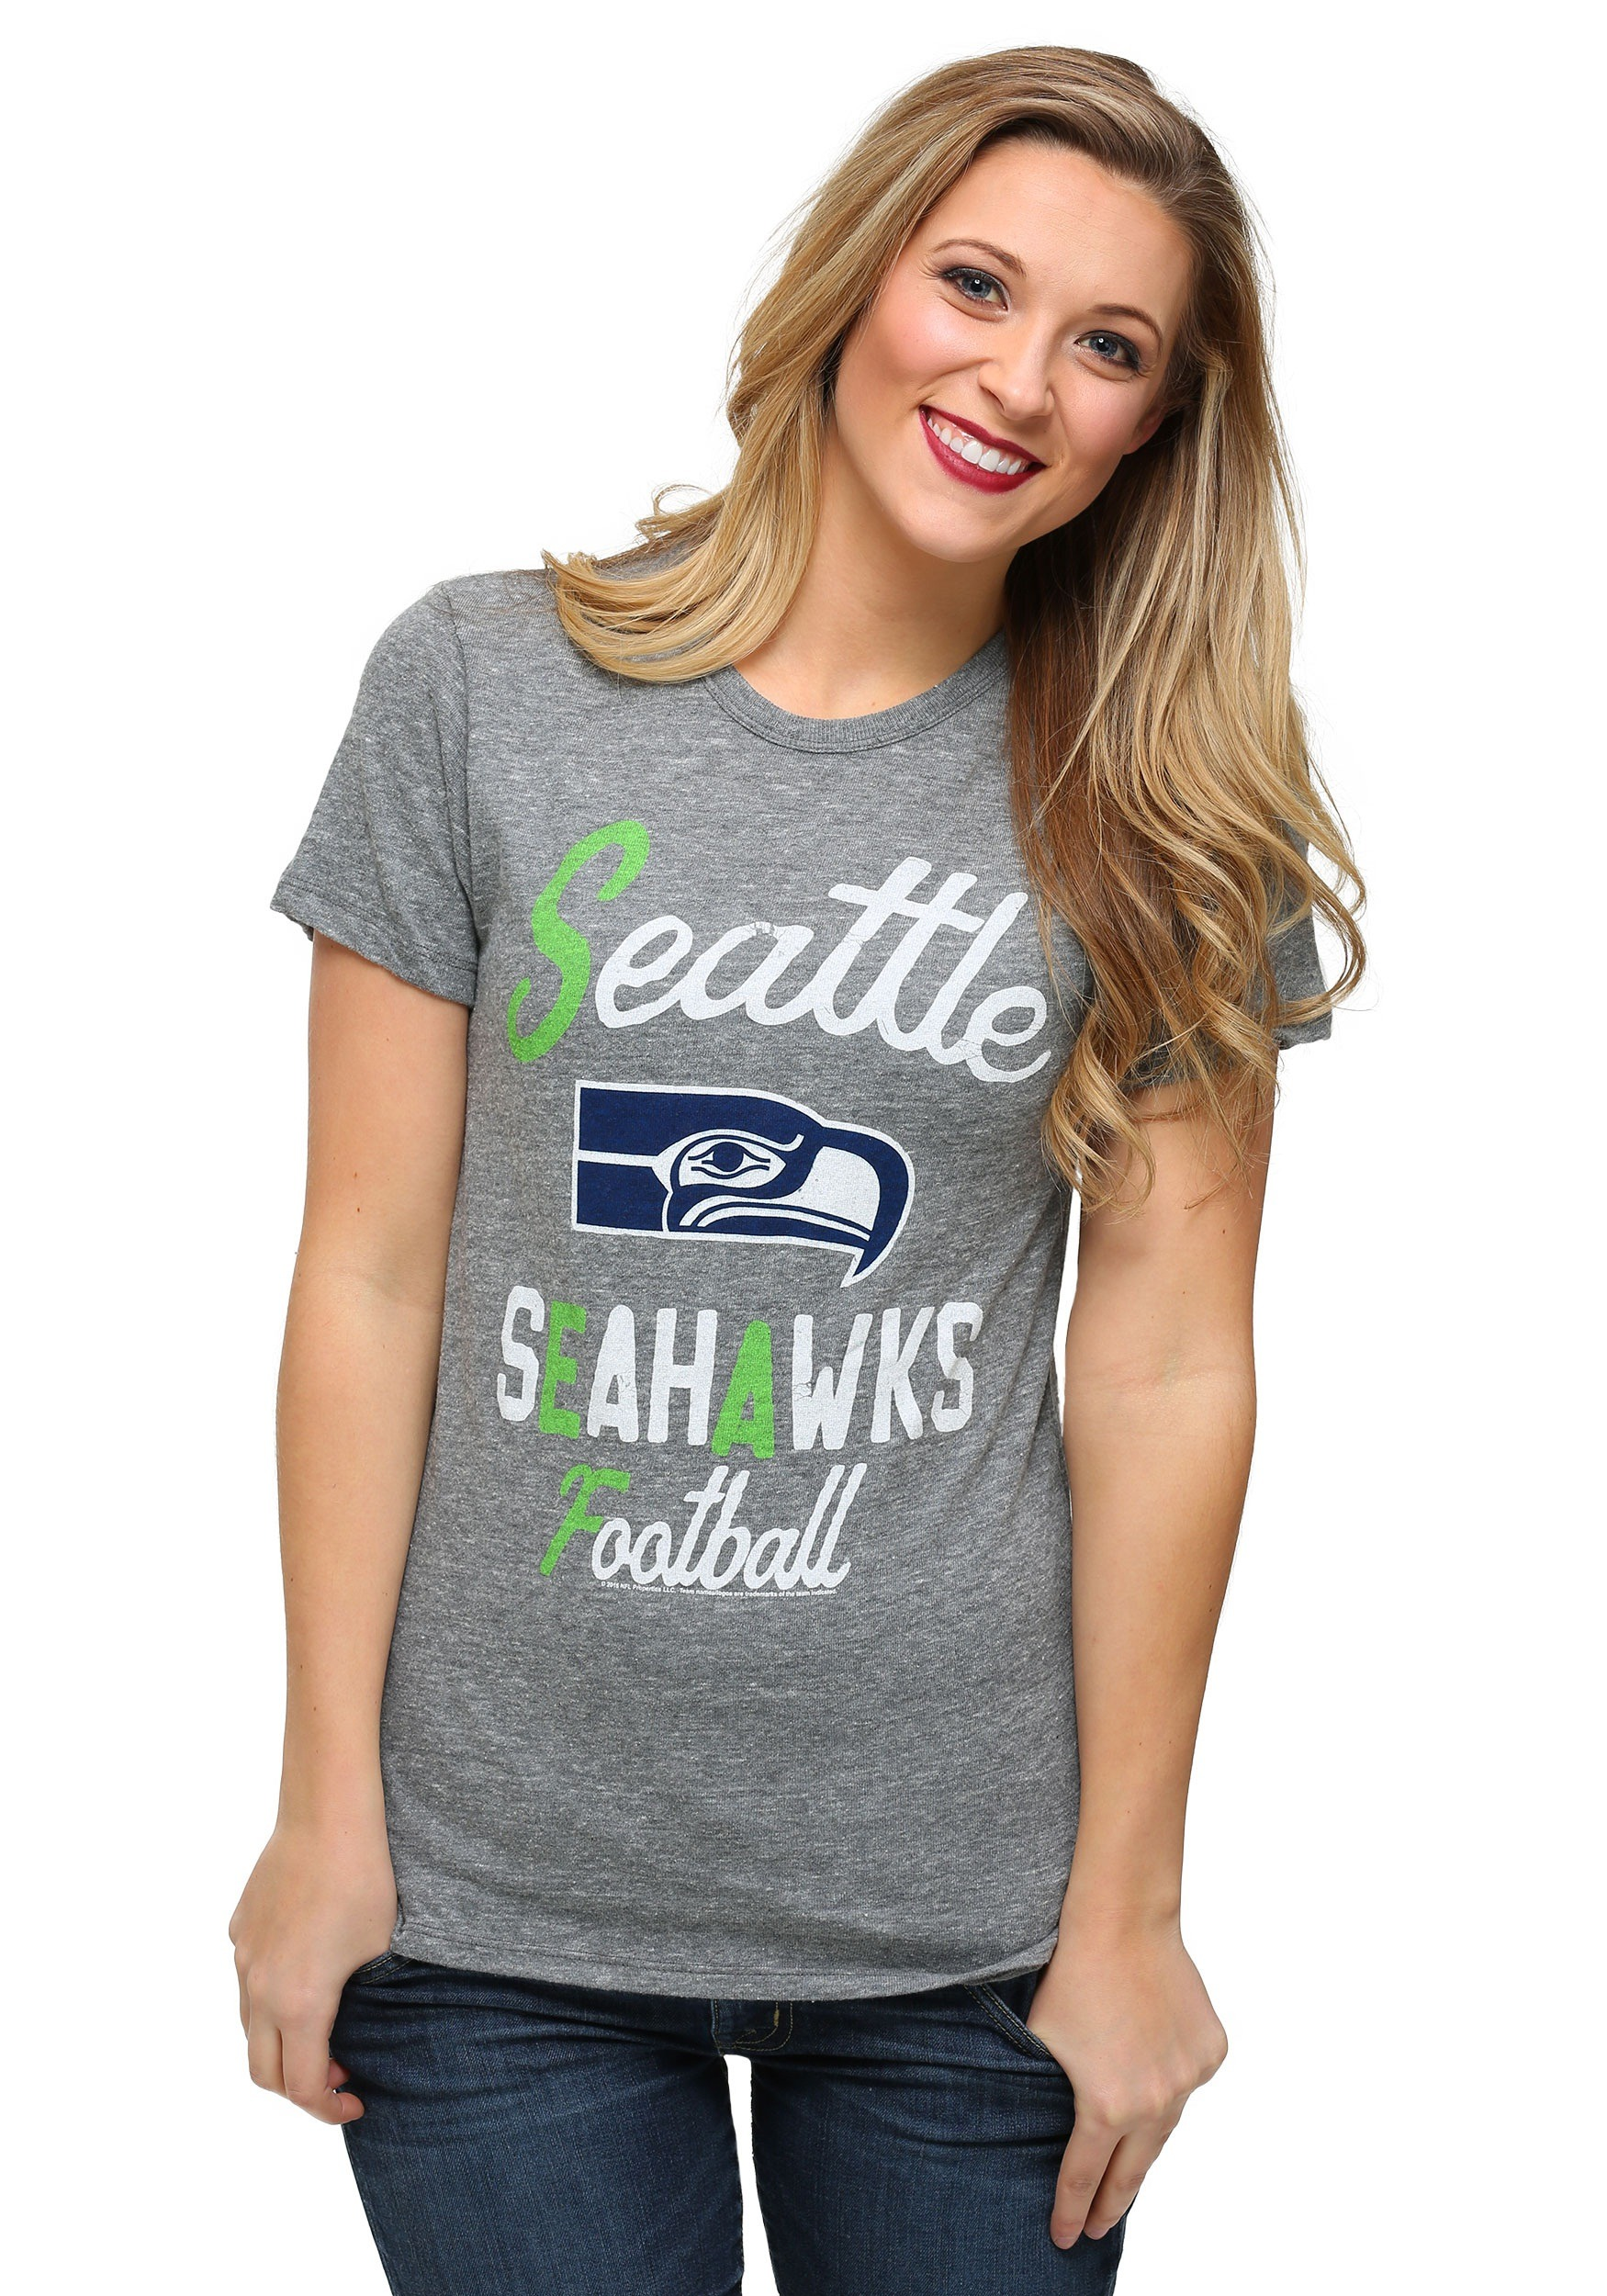 Seattle seahawks touchdown tri blend womens t shirt for Seahawks t shirt womens walmart